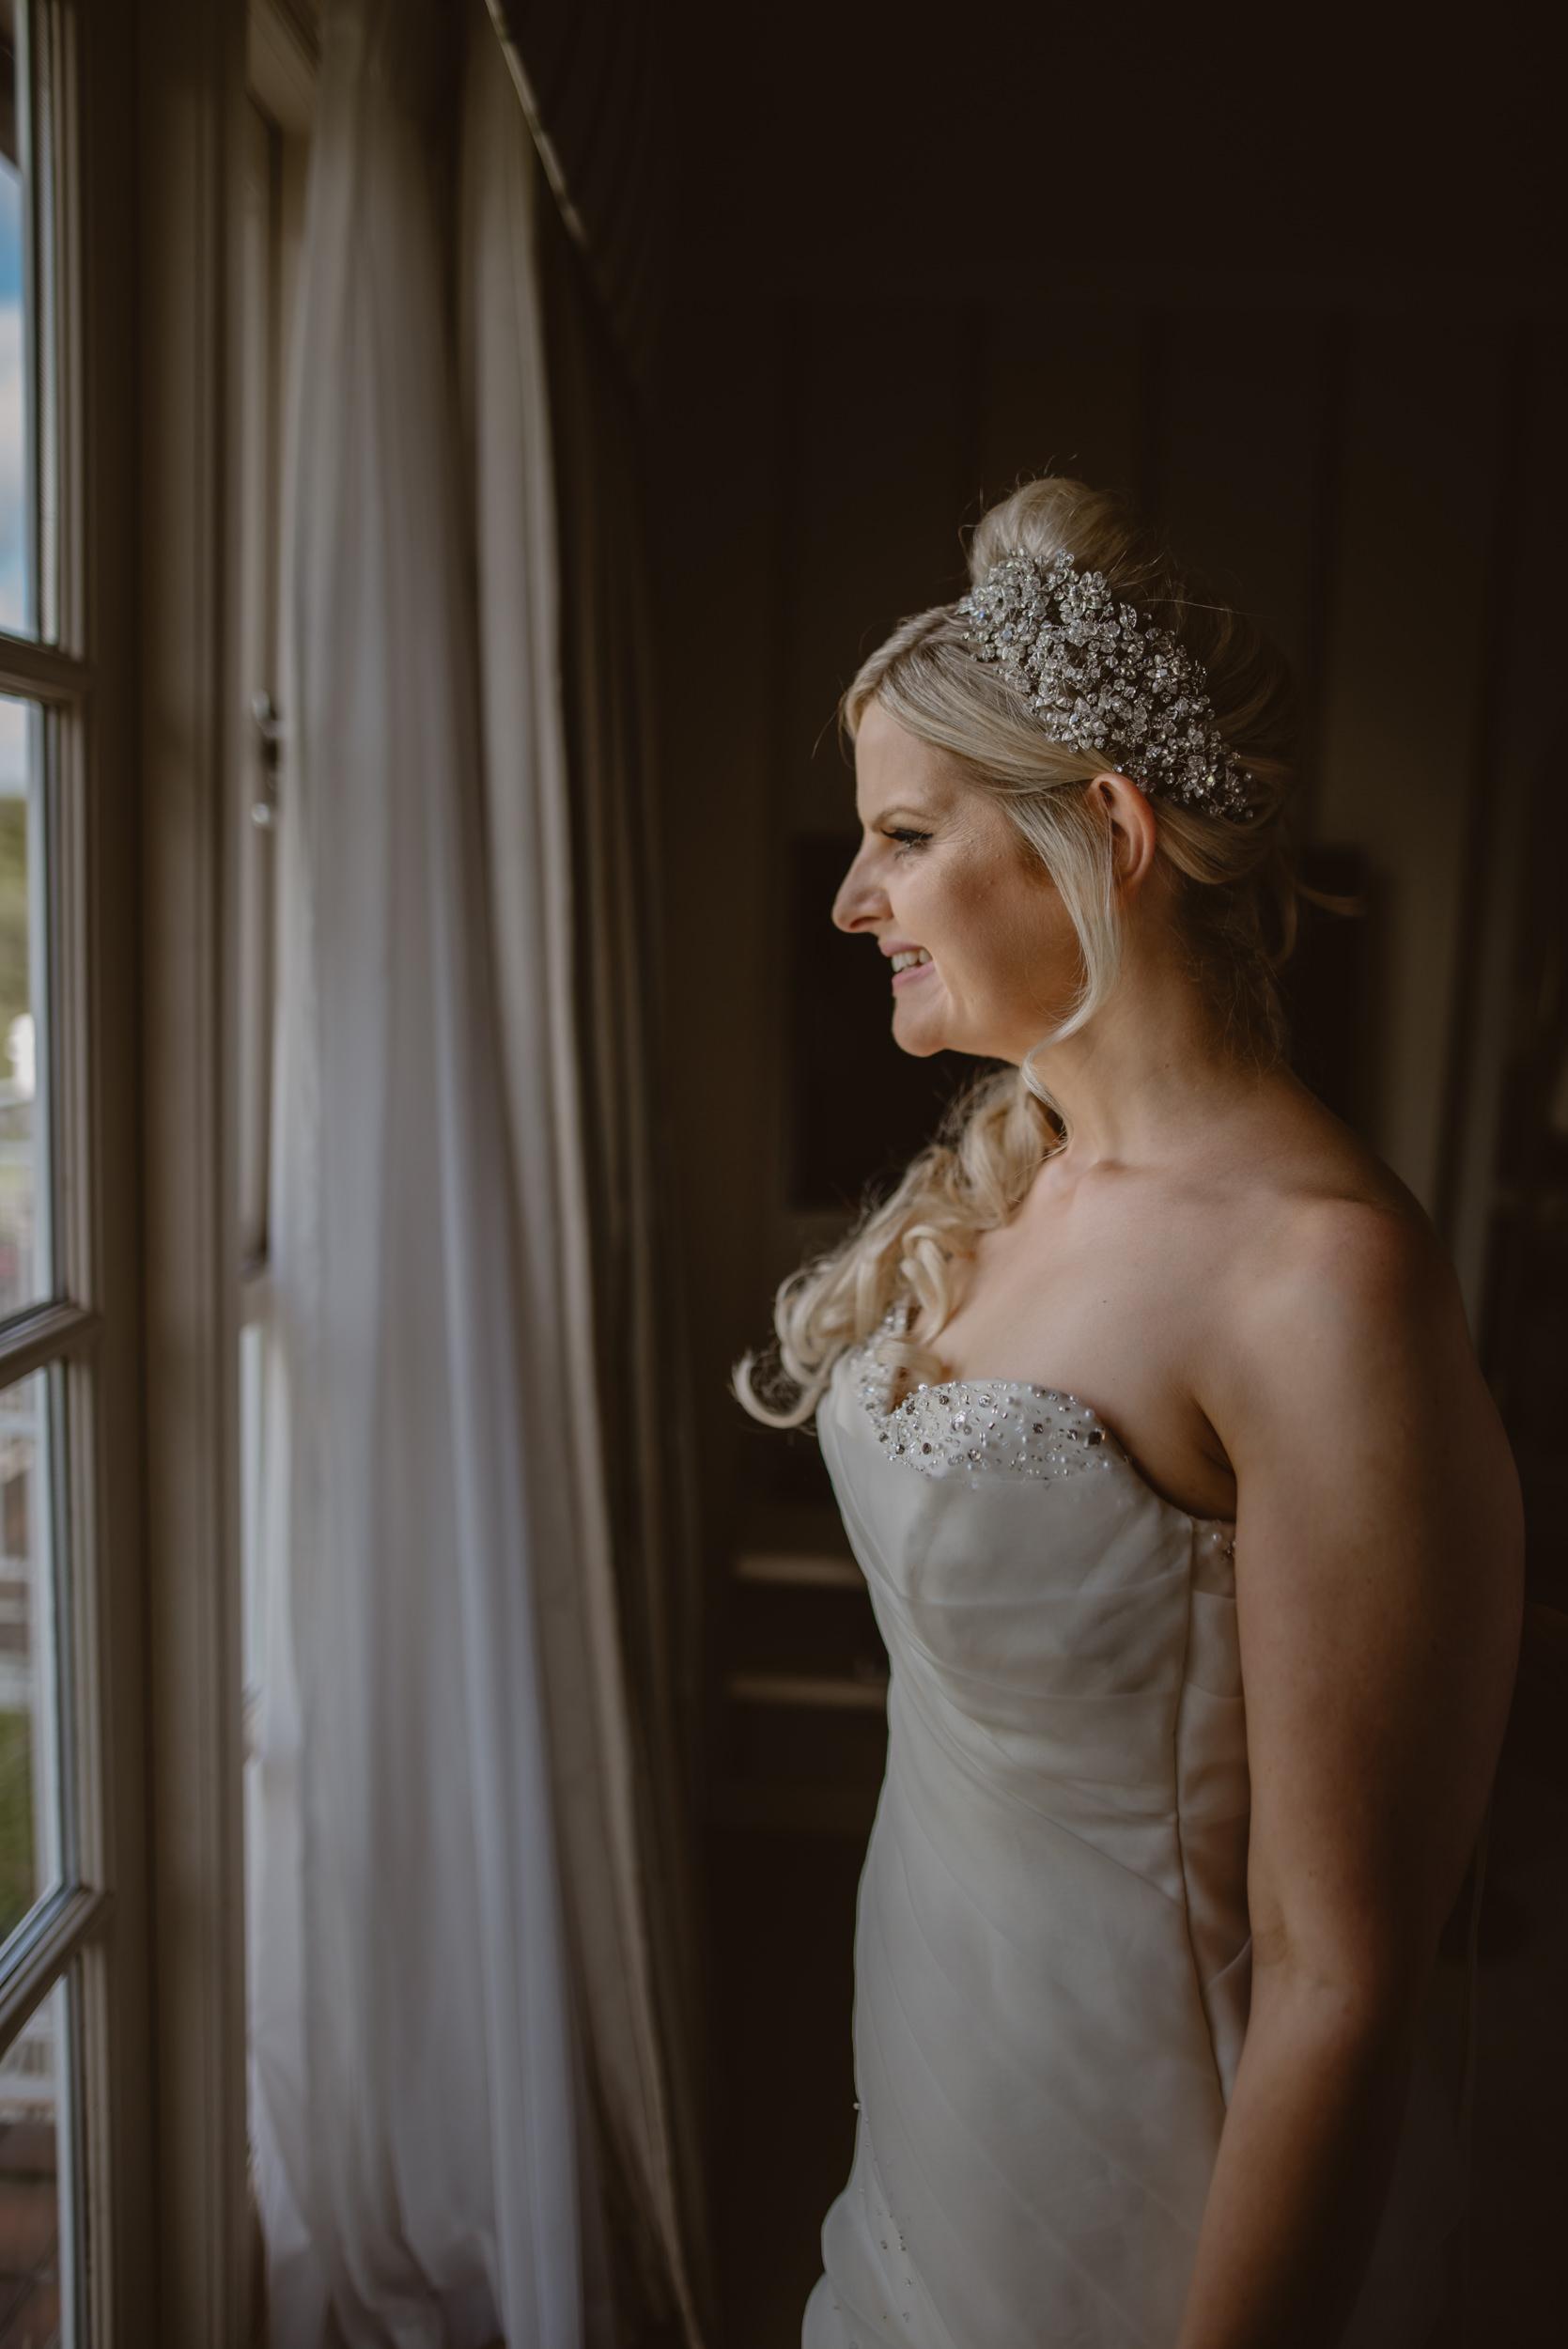 Trisha-and-Roger-wedding-The-Priory-Church-and-Chewton-Glen-Hotel-Christchurch-Manu-Mendoza-Wedding-Photography-045.jpg